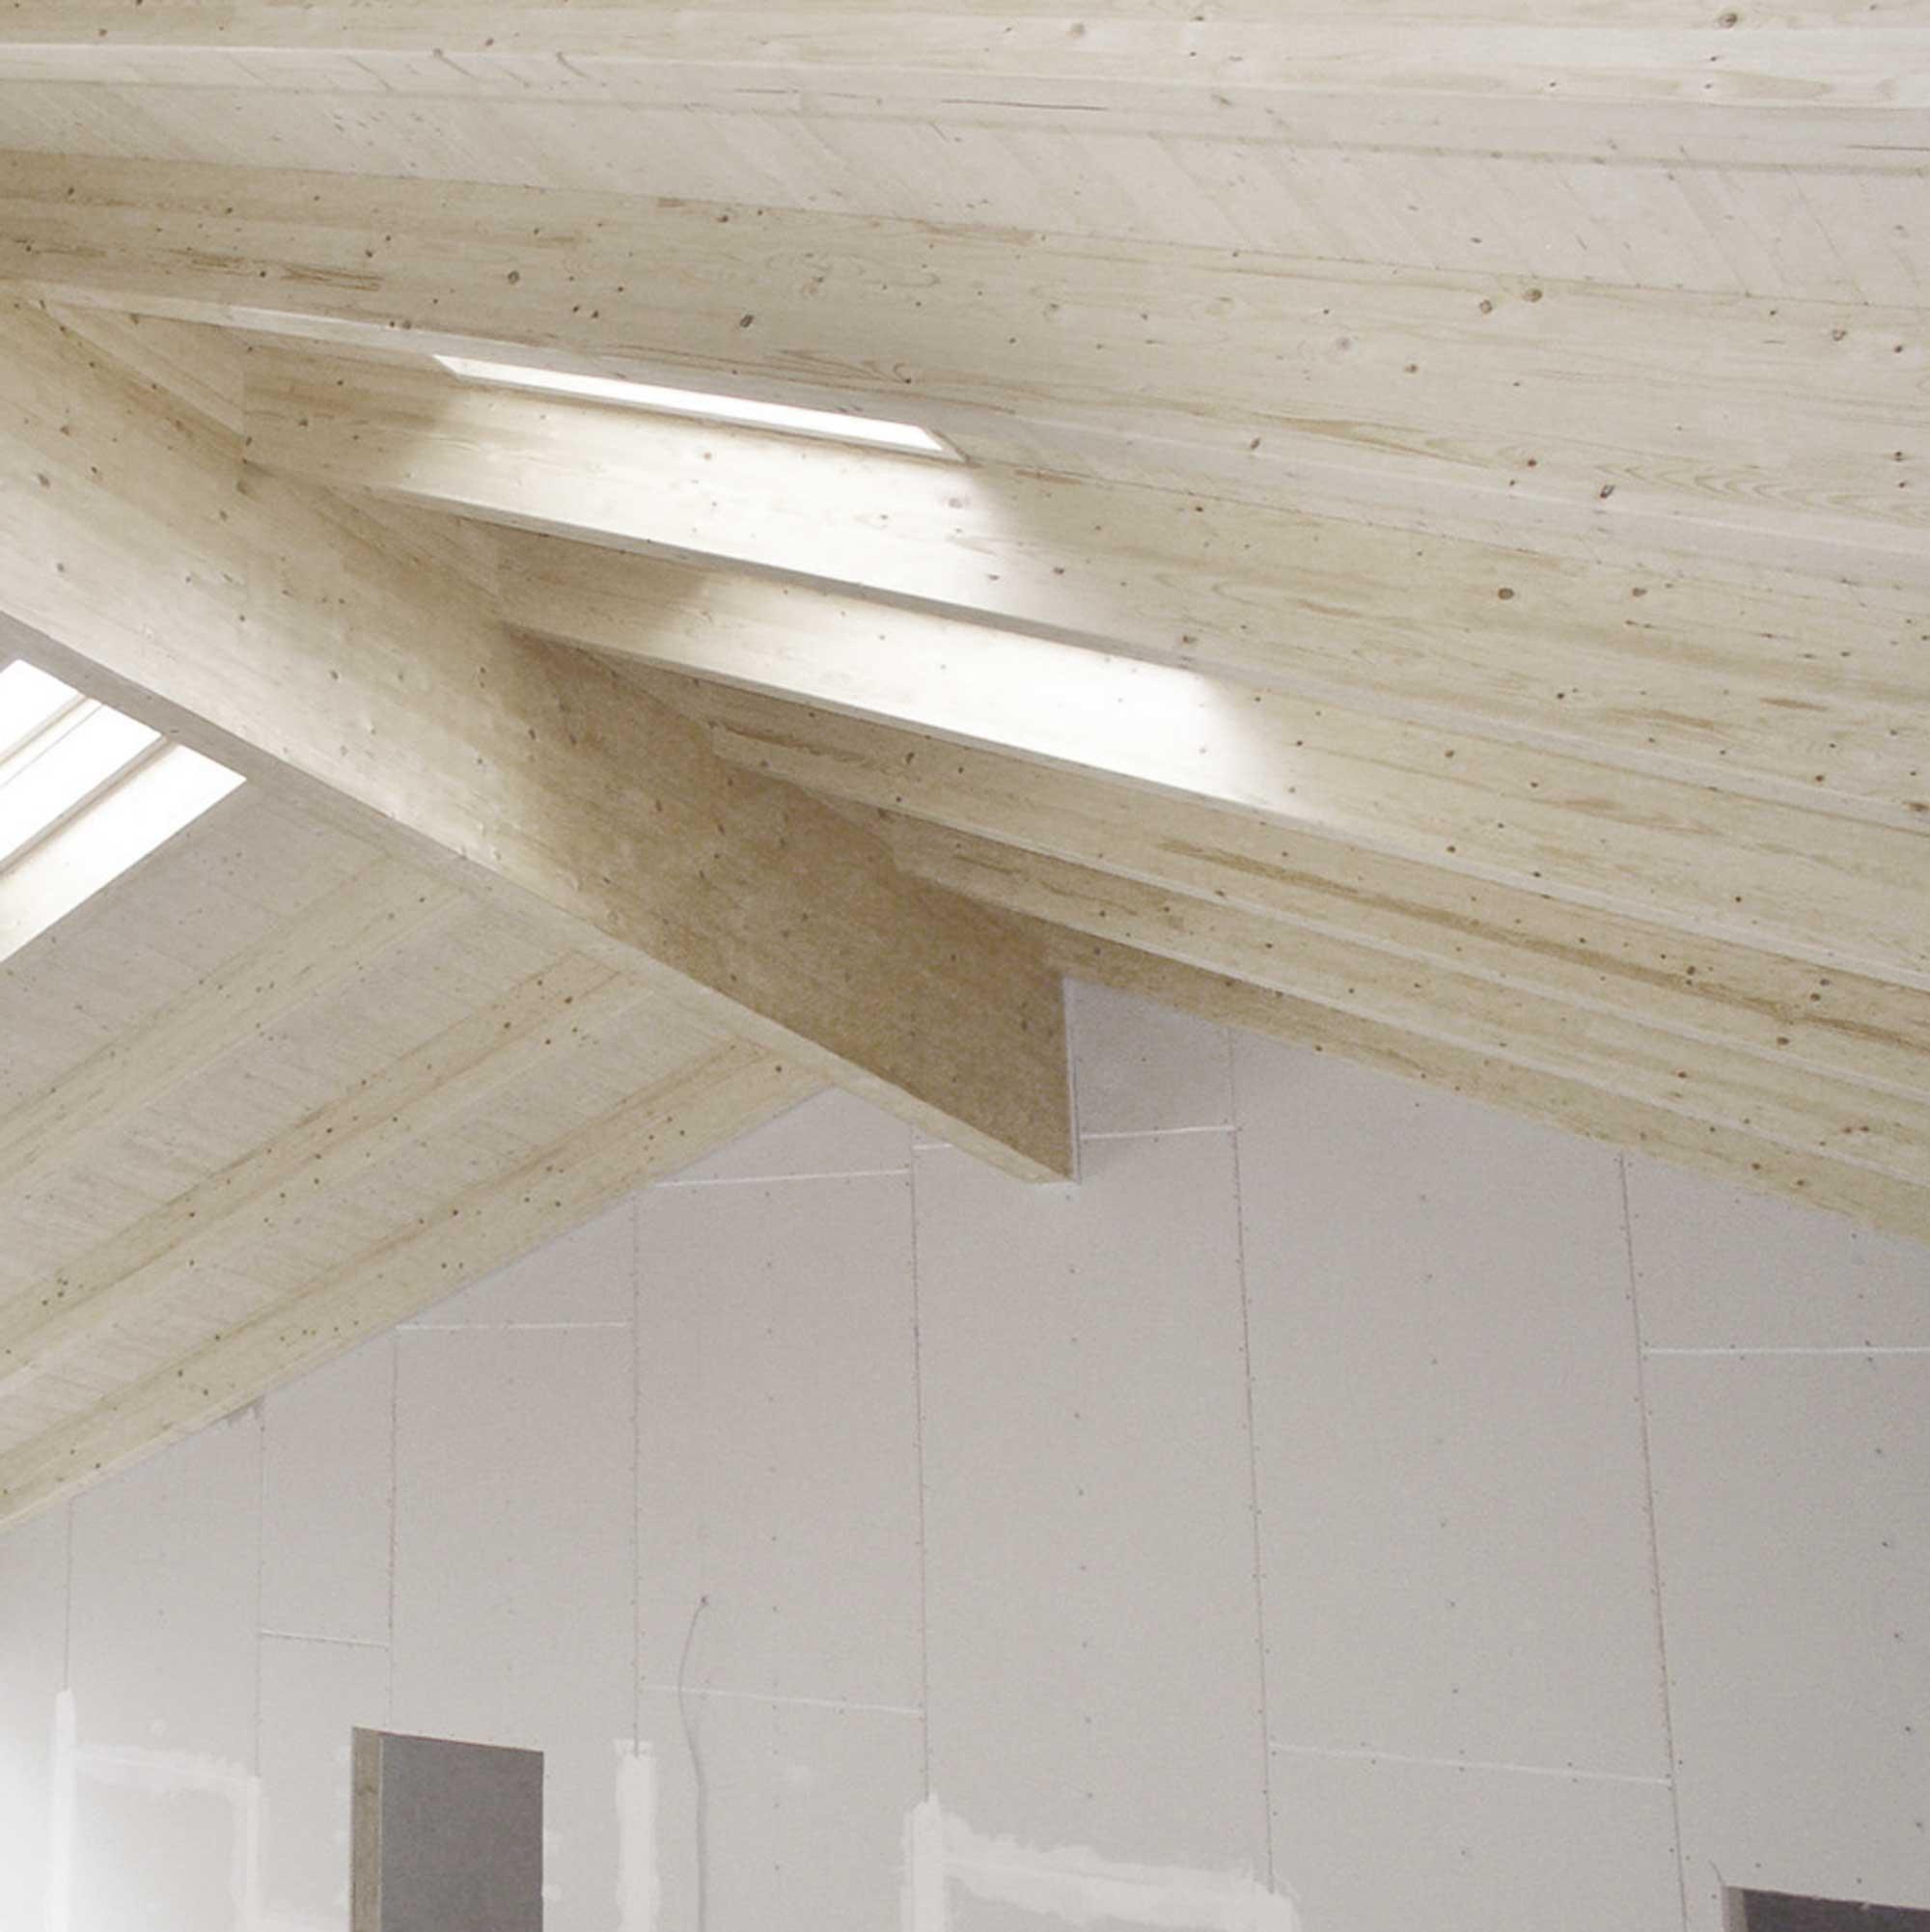 Dachstuhl aus KVH – HolzLand Verbeek